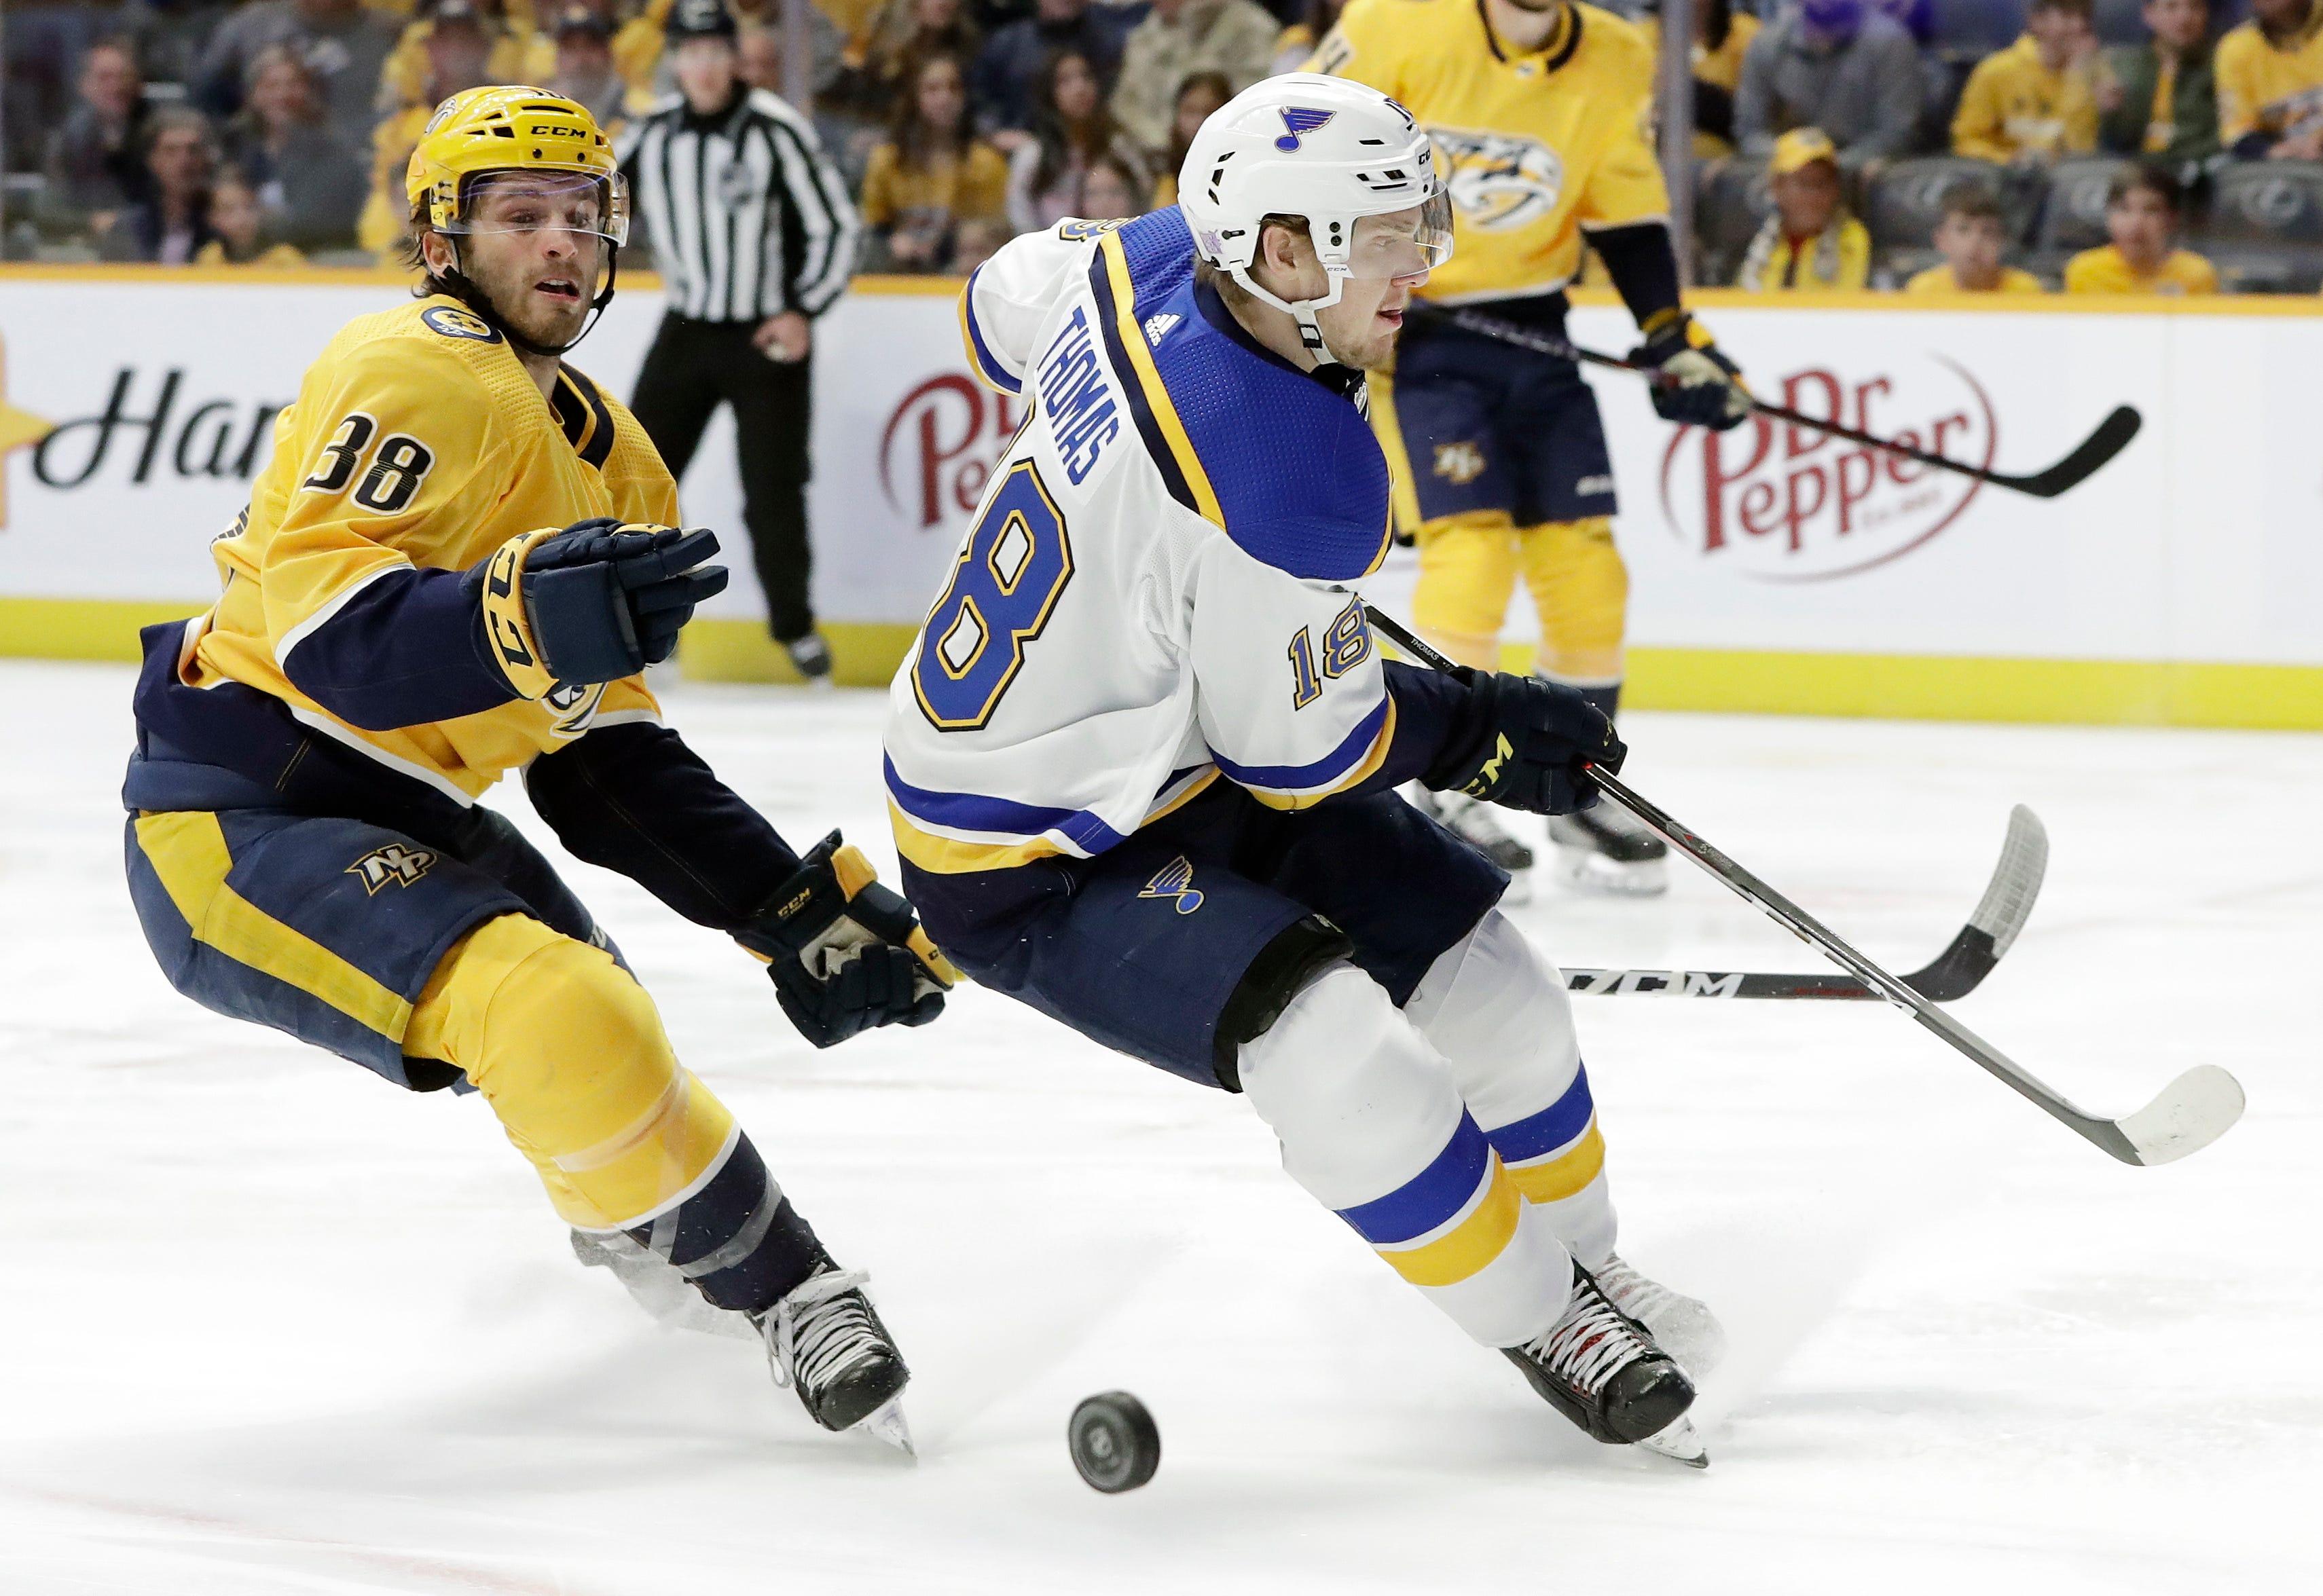 Rinne sets mark for Finnish goalies, Predators top Blues 4-1